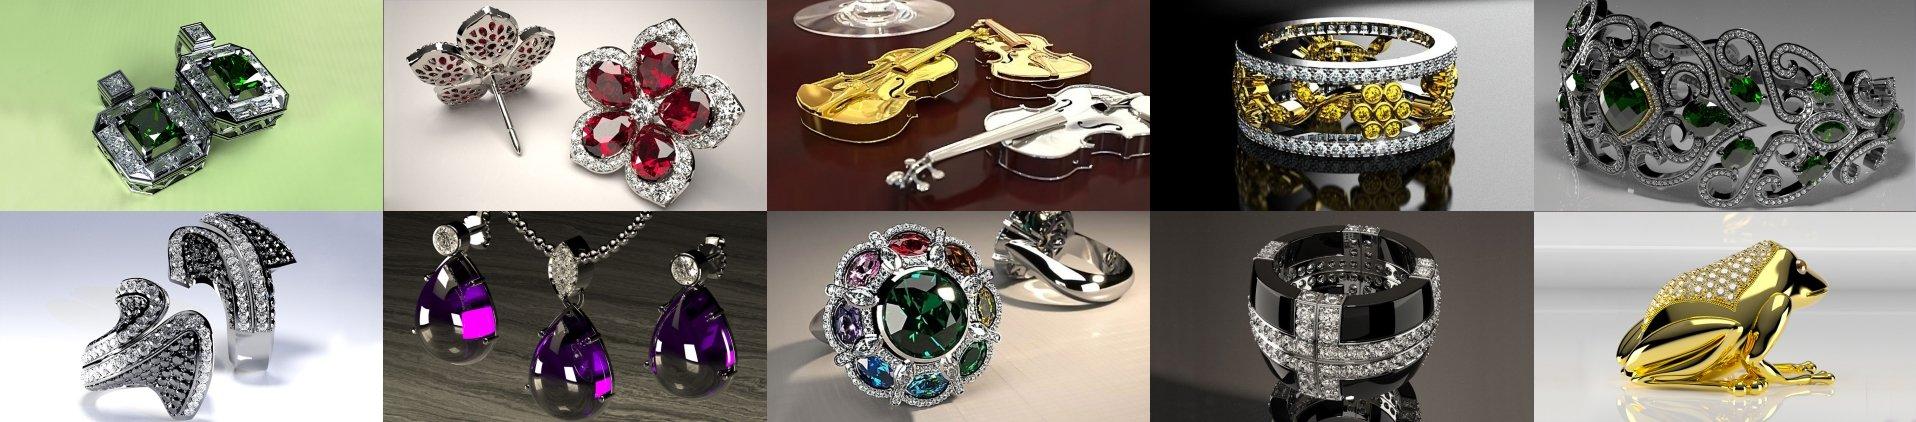 Jewelry Design Software Banner